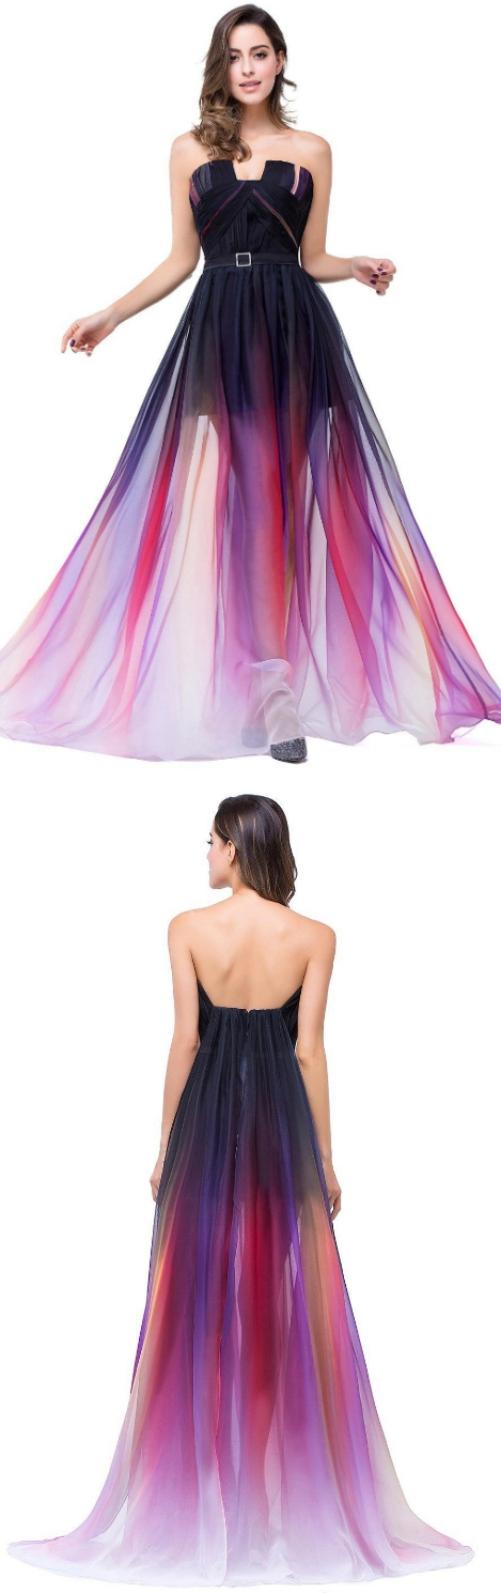 Discount black prom dresses long prom dresses long black prom